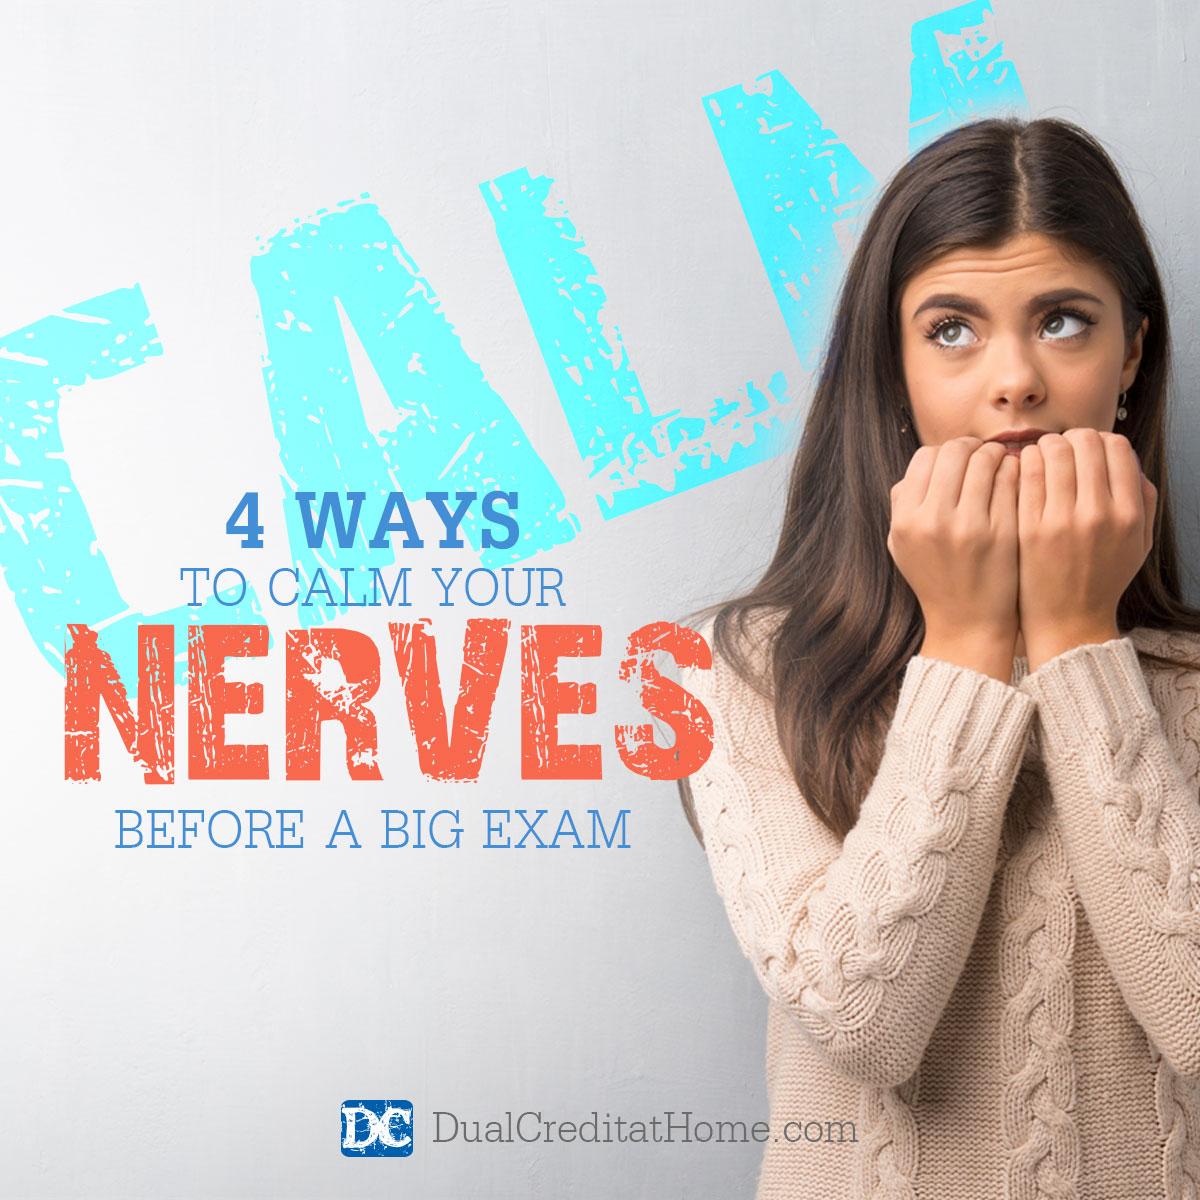 4 Ways to Calm Your Nerves Before a Big Exam